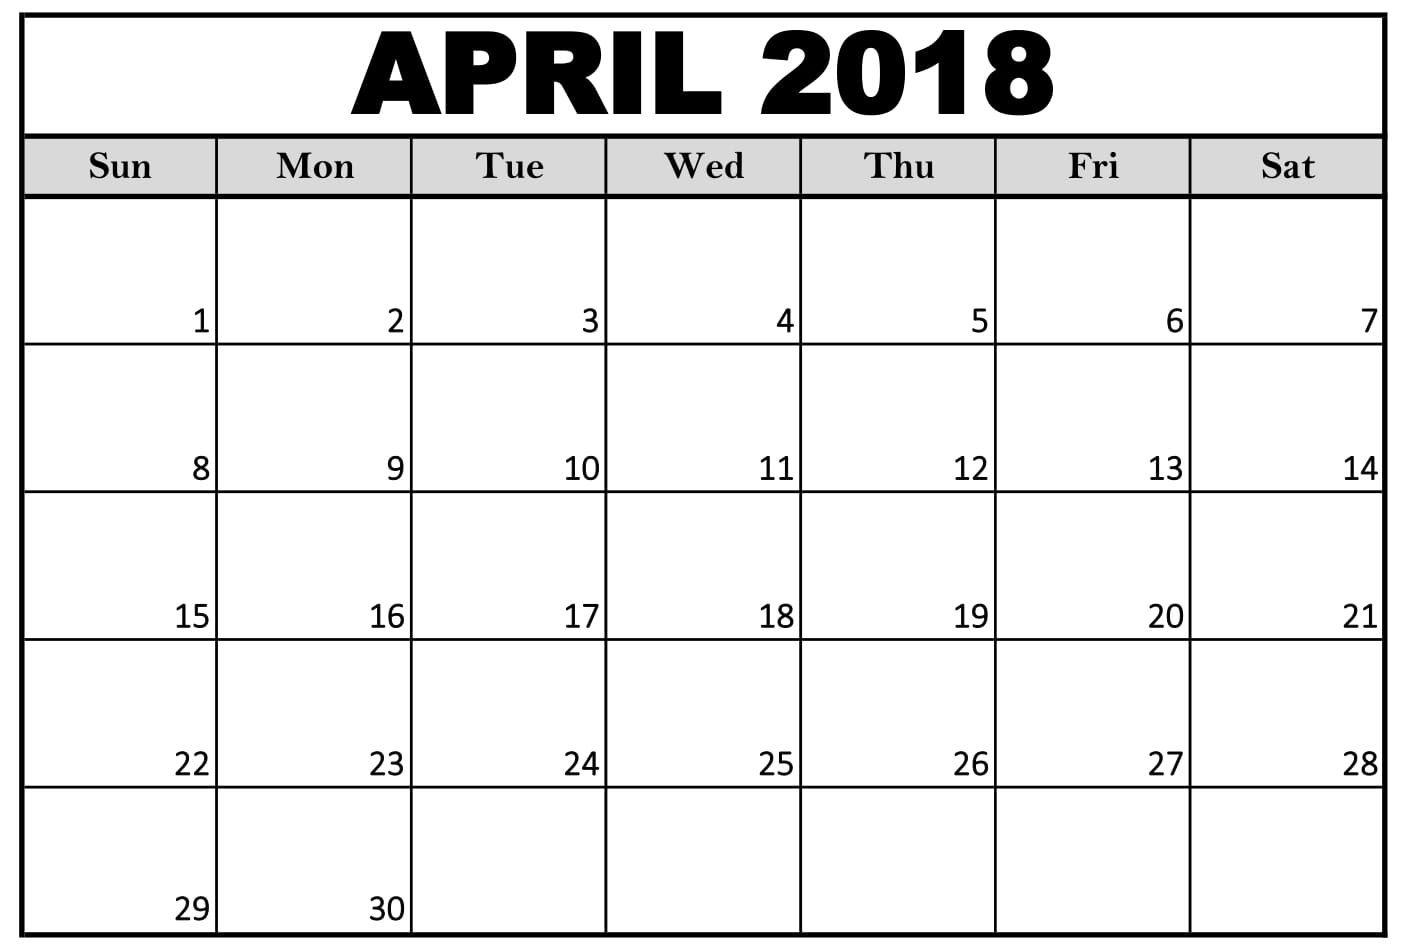 April 2018 Calendar Page Word Excel Pdf Template Calendar